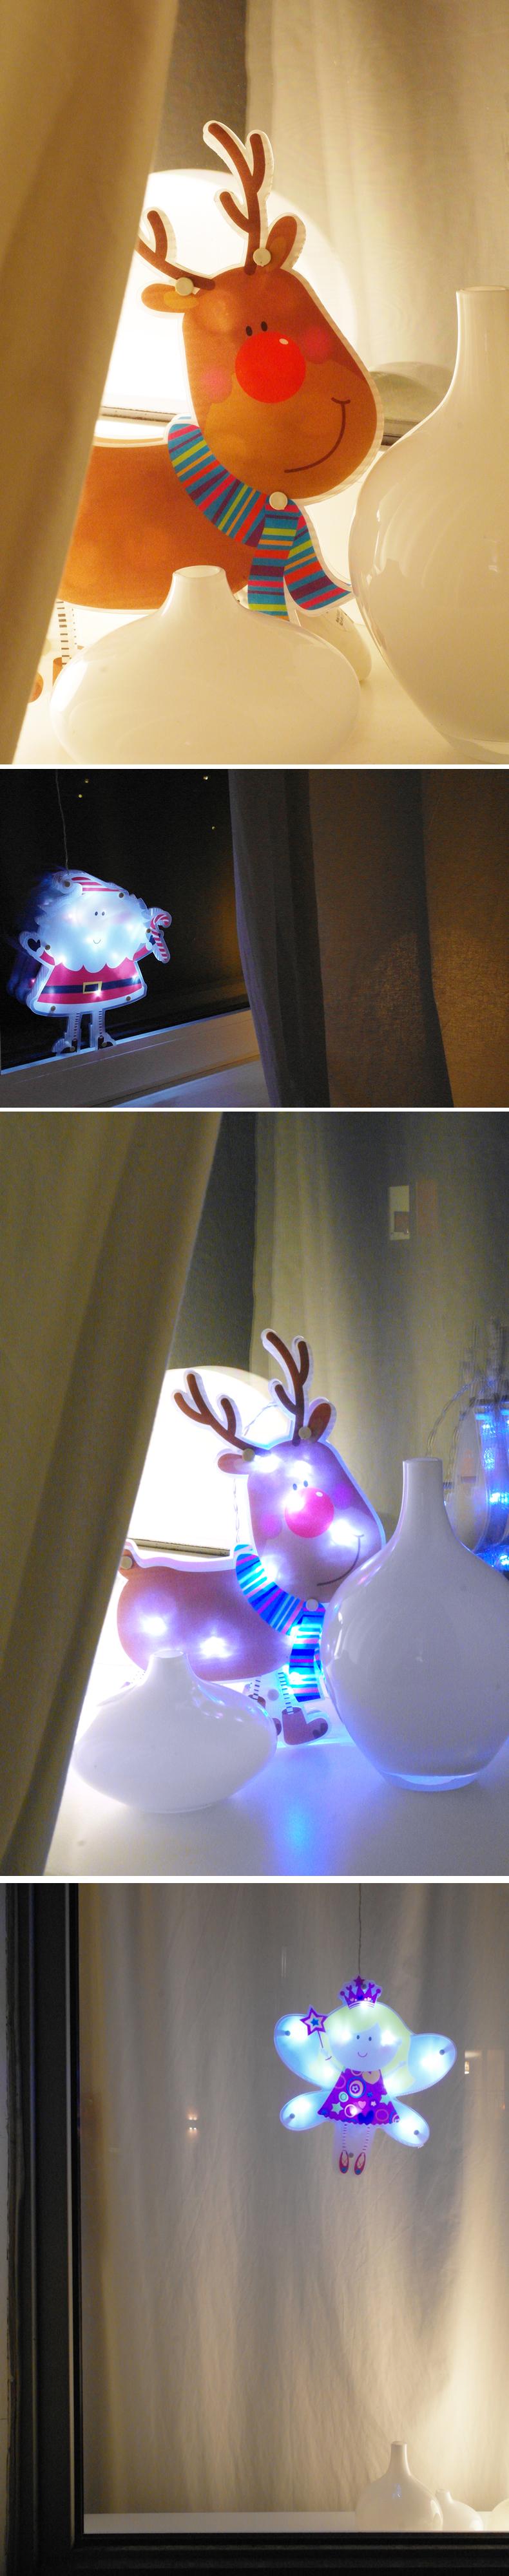 Kinder weihnachtsbeleuchtung fenster lampe fensterbild for Weihnachtsbeleuchtung fenster